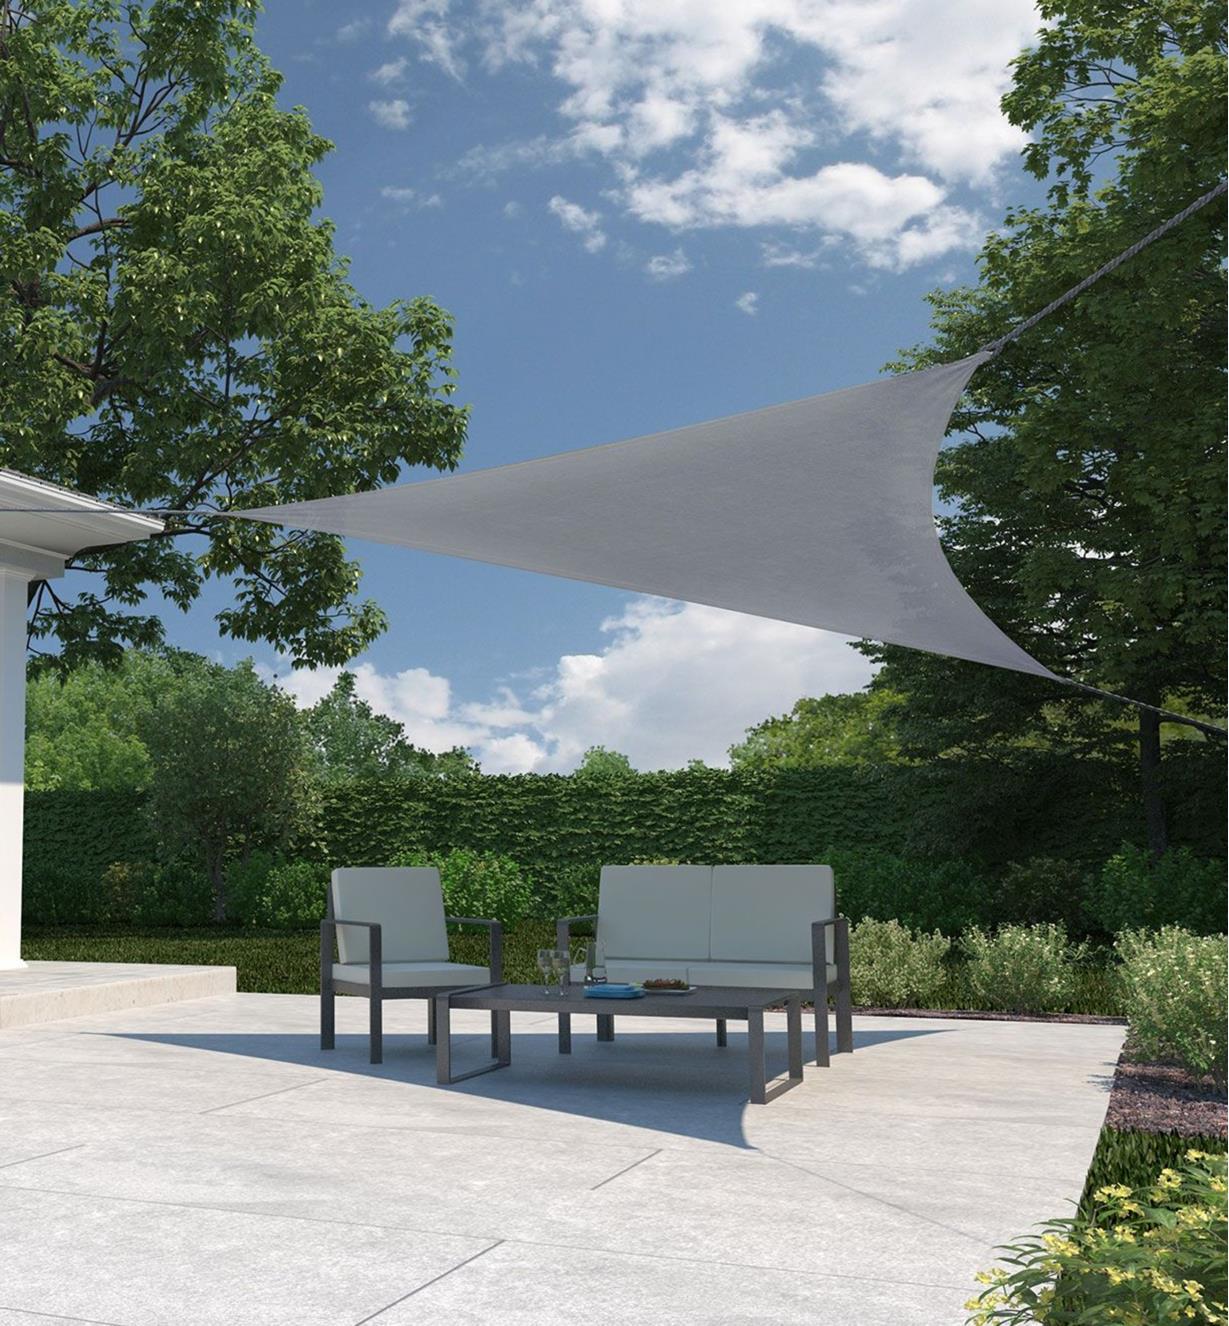 Triangle shade sail providing shade on an outdoor patio